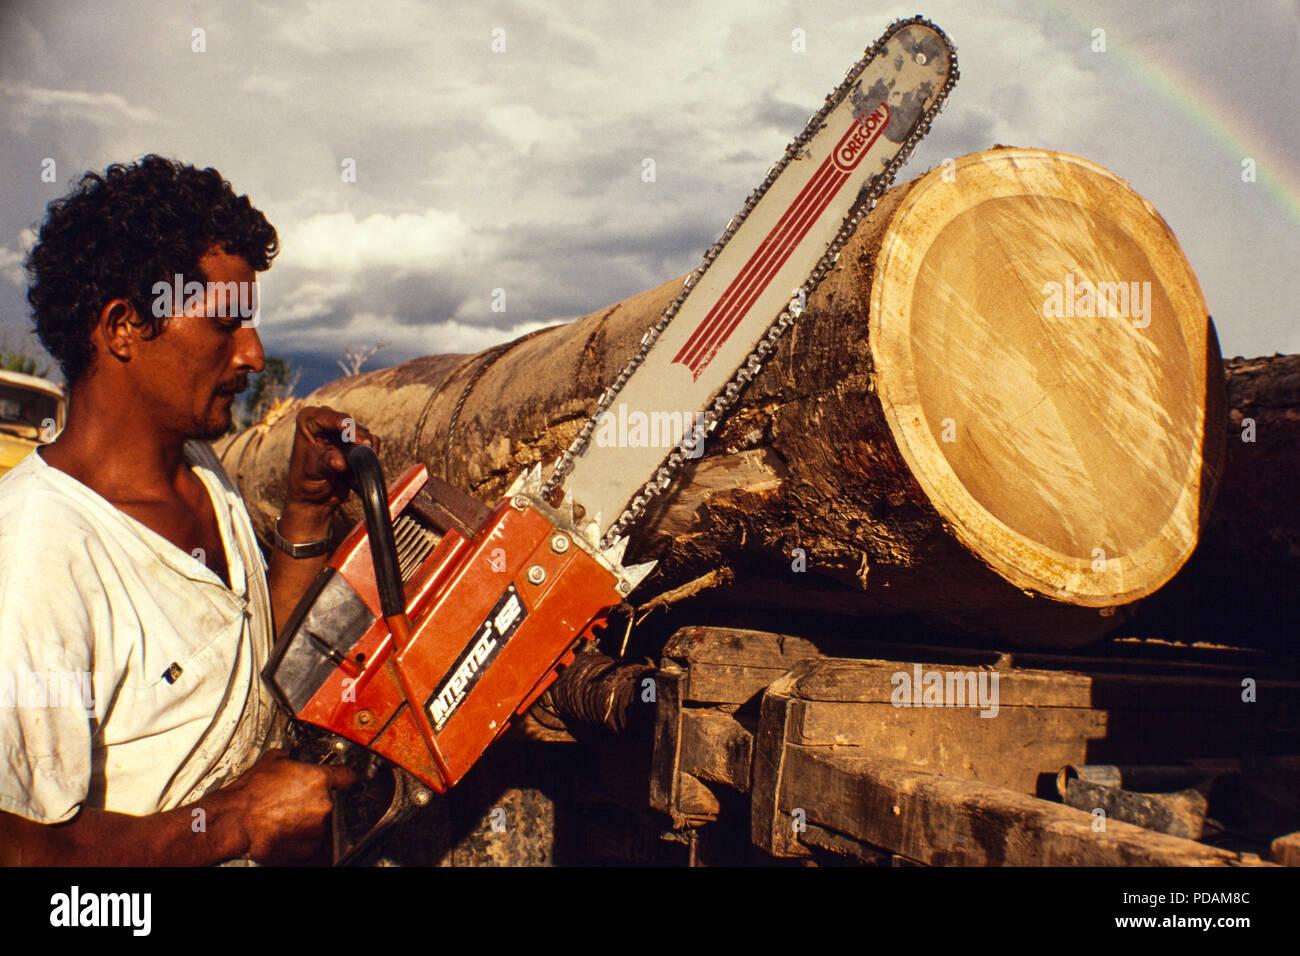 Logging, Amazon rainforest deforestation, transportation of heavy and big tree truncks, Acre State, Brazil. - Stock Image